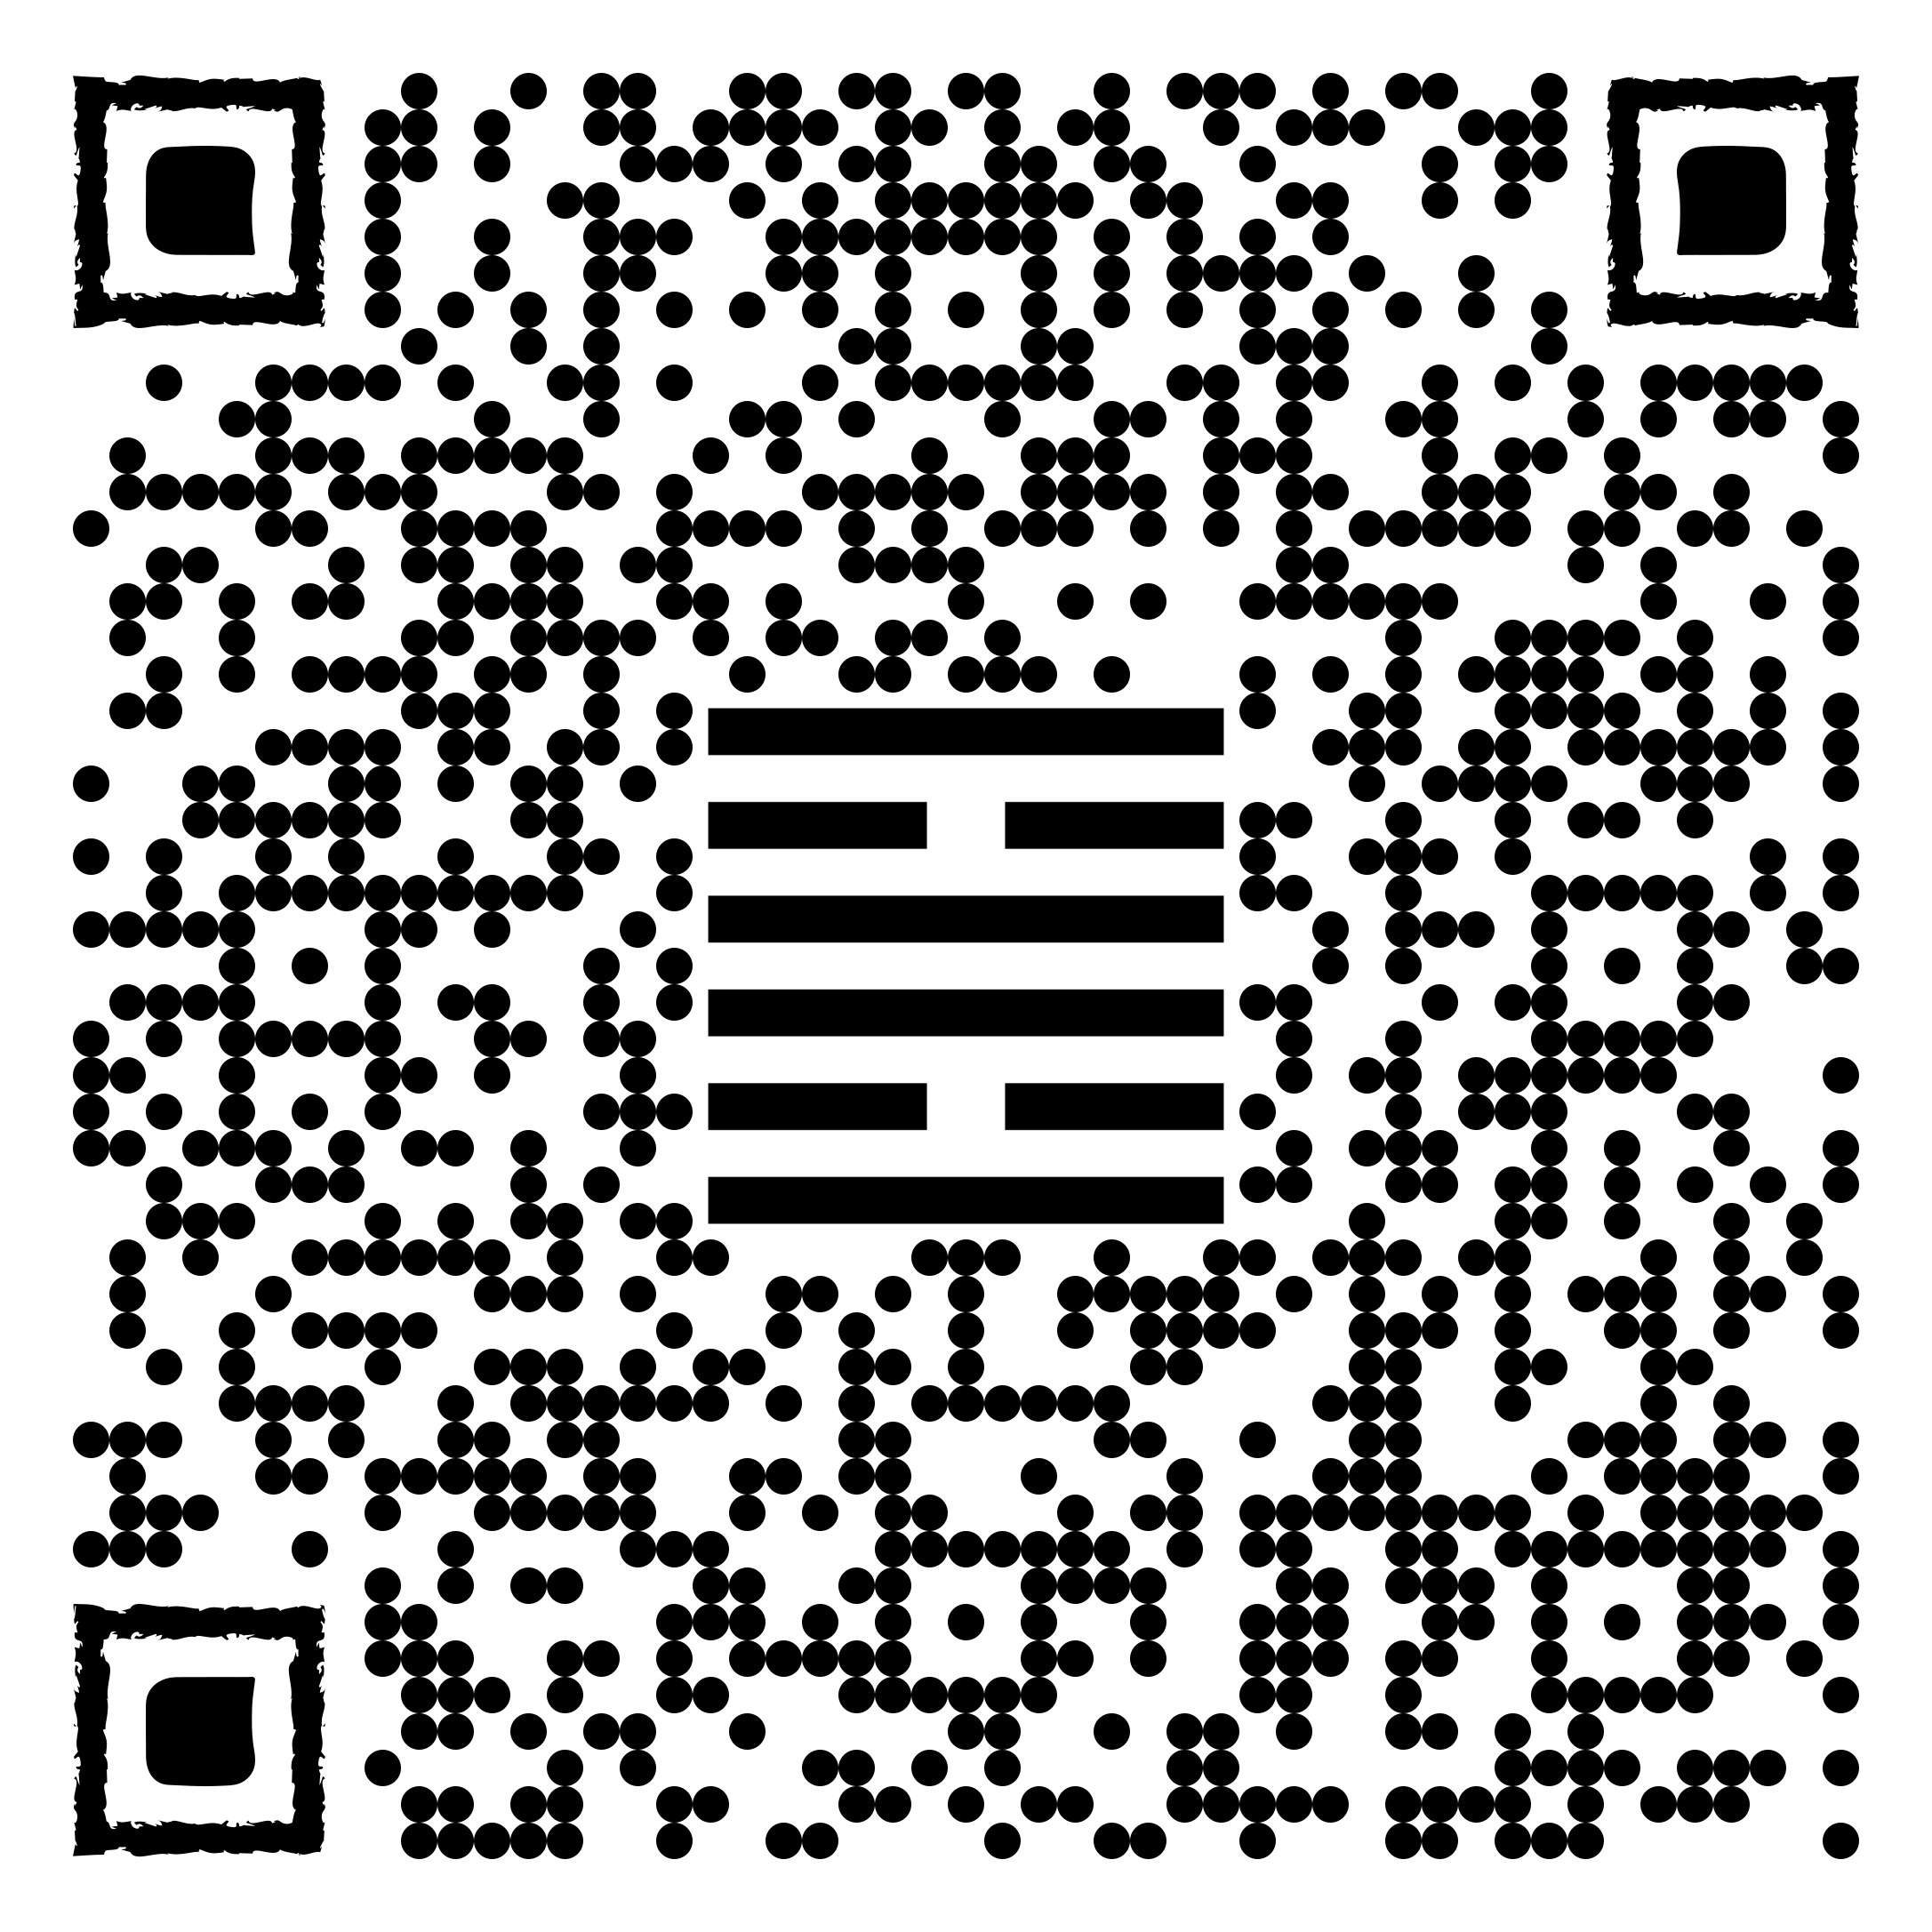 qr-code-30.png